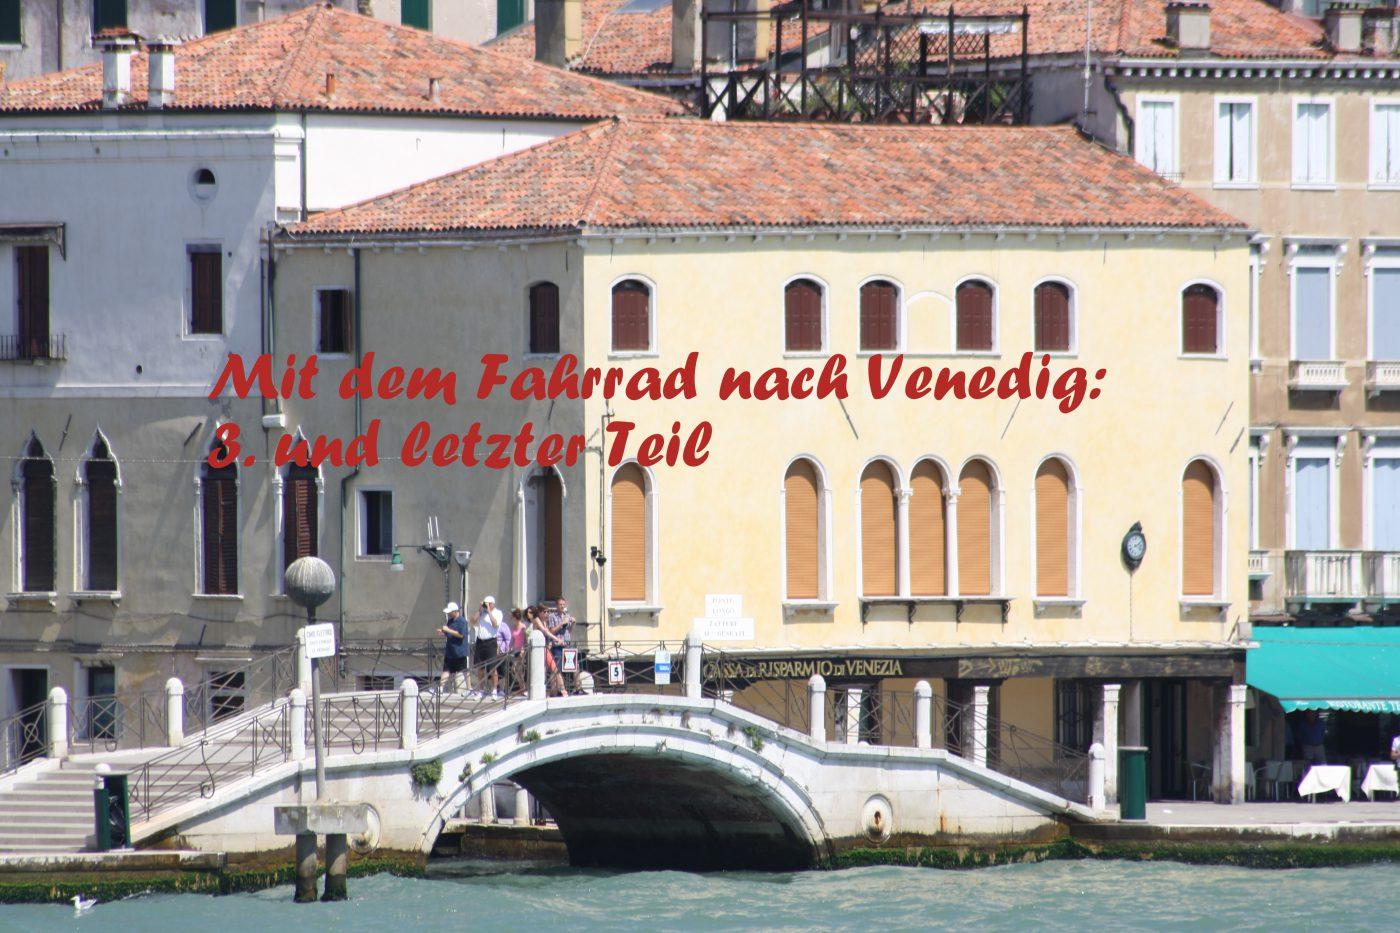 Nach Venedig mit dem Rad: 3. Teil 6